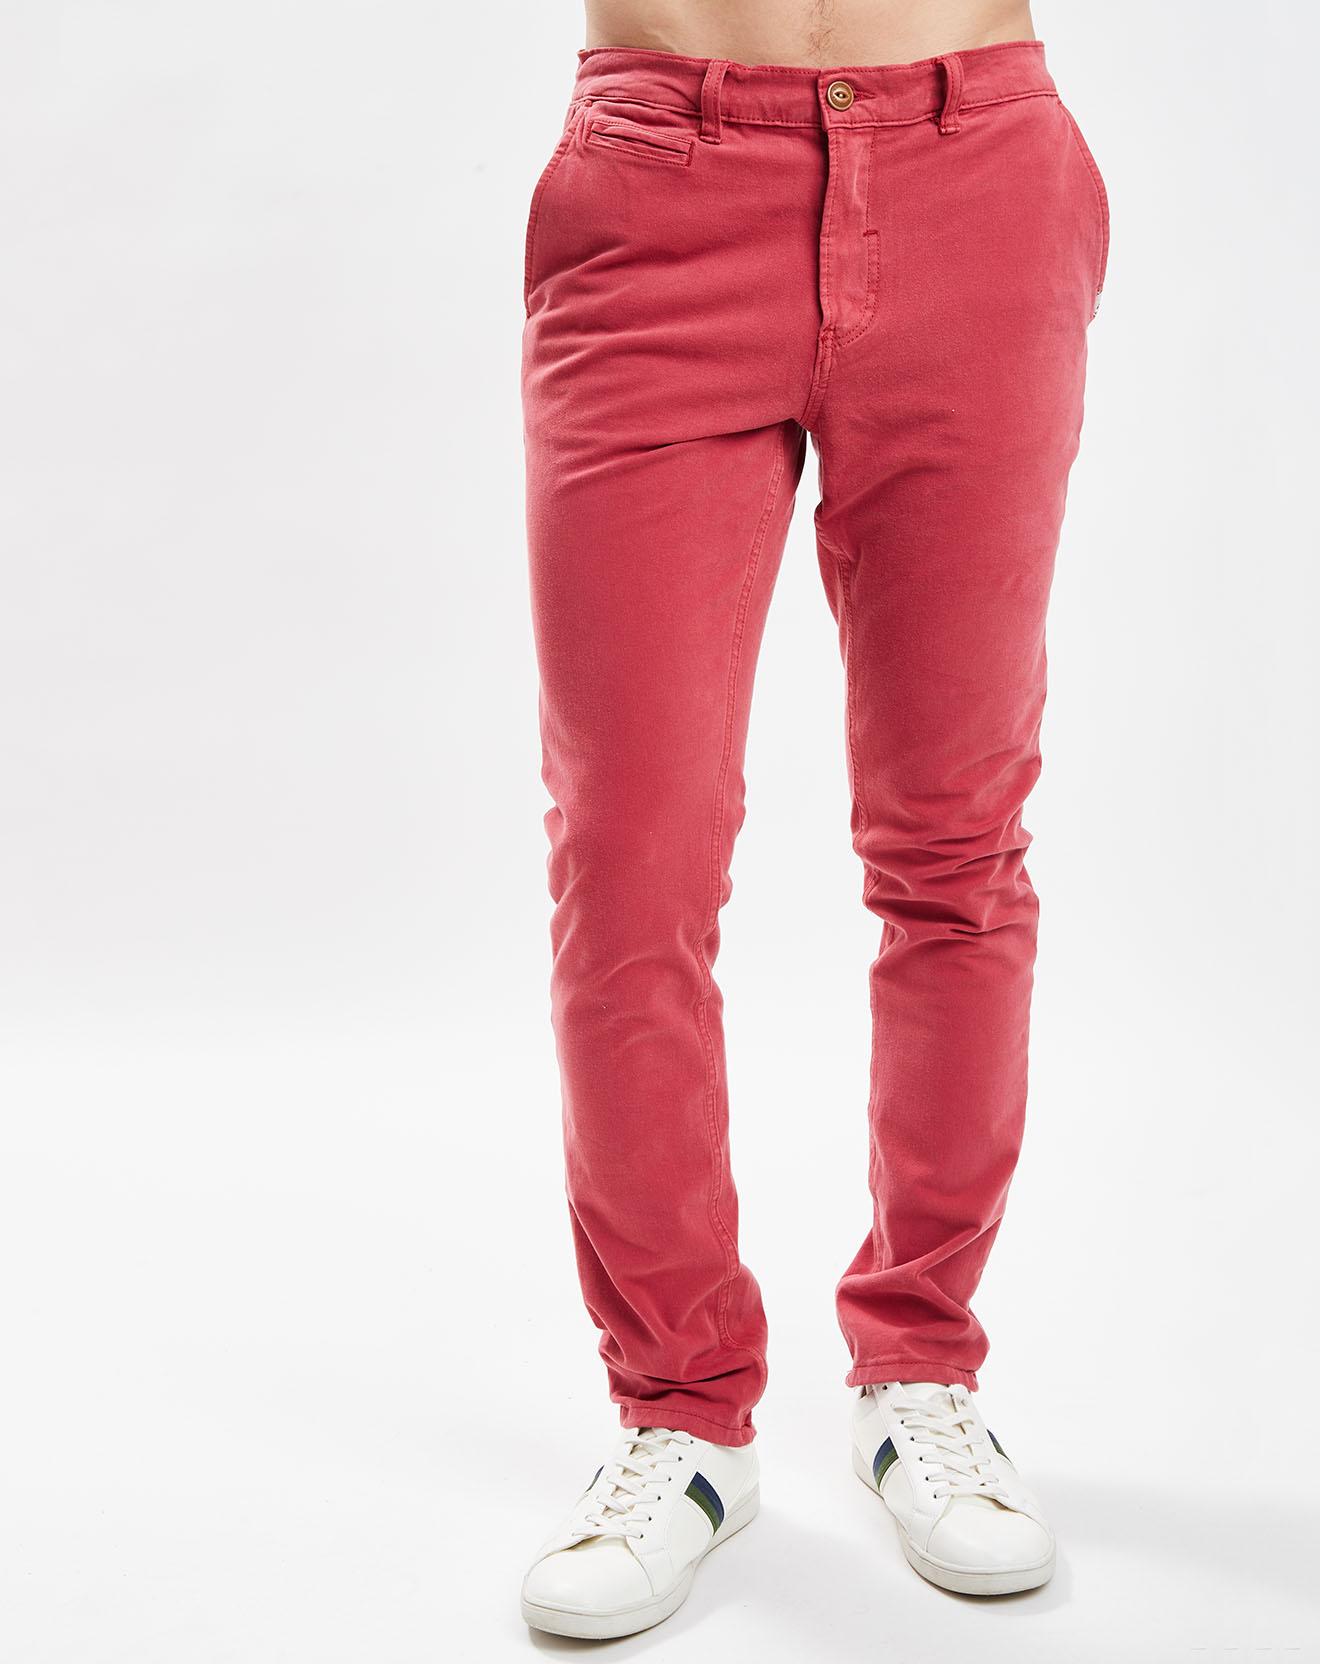 Pantalon chino slim Krandy rouge - Quiksilver - Modalova